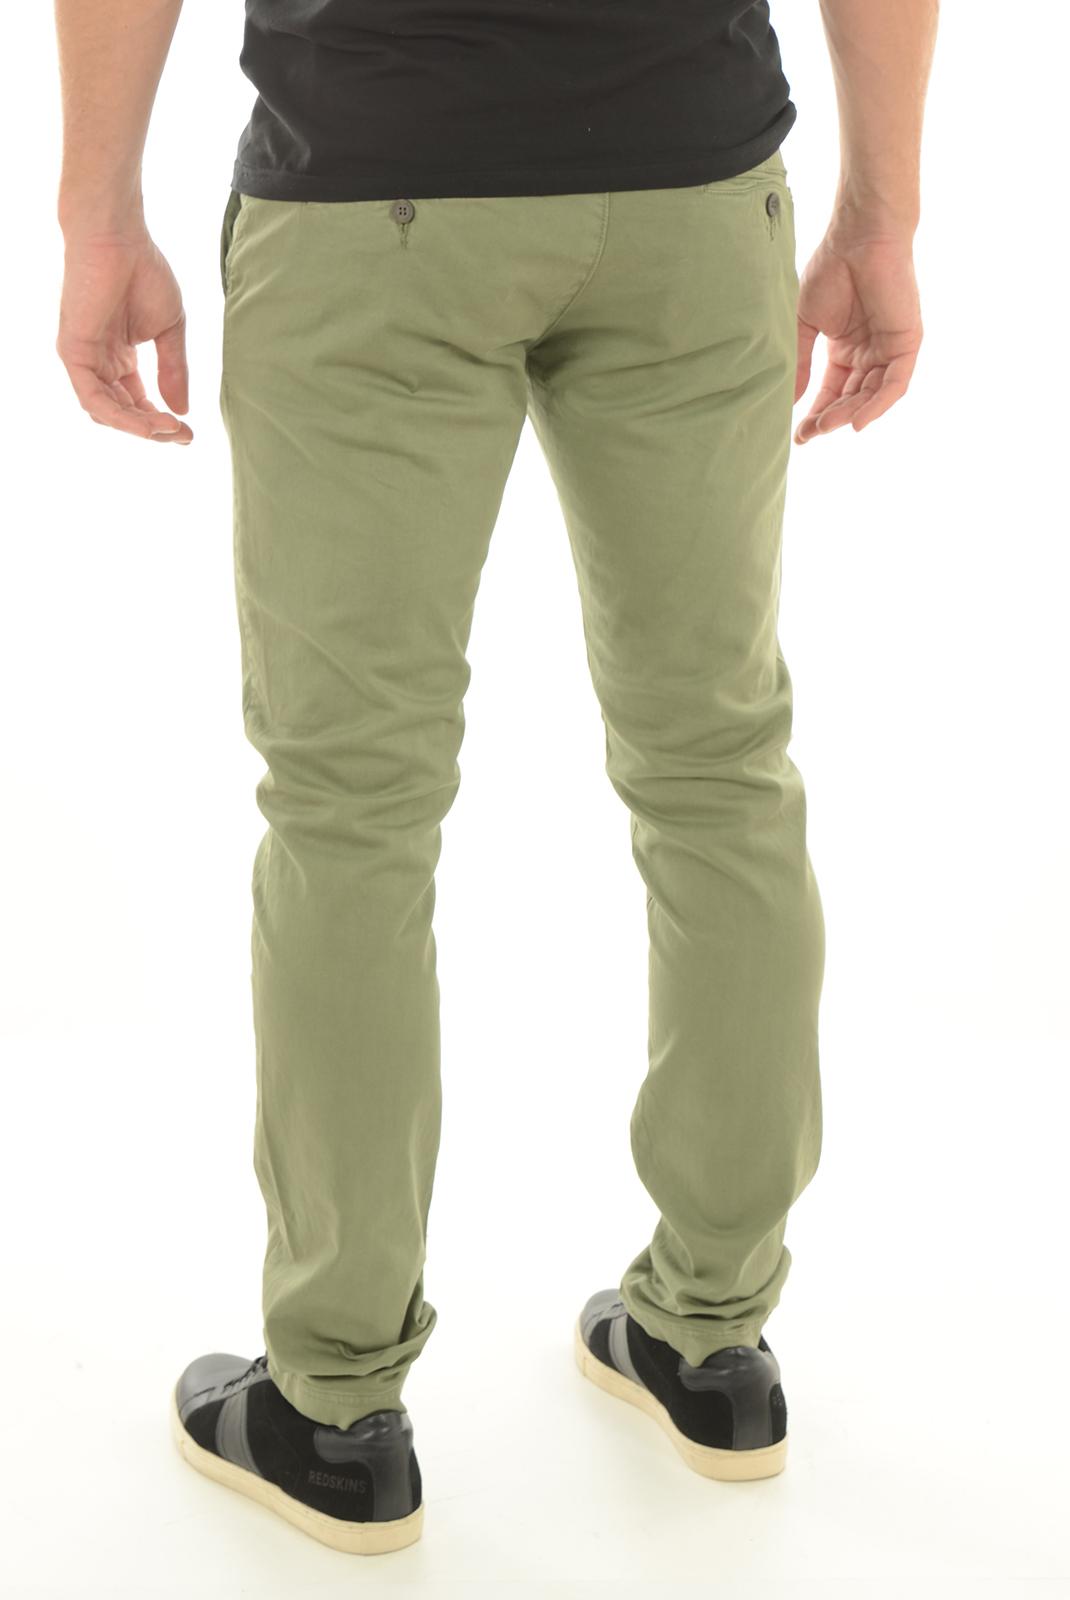 Pantalons  Never KALIDRY DK KAKI